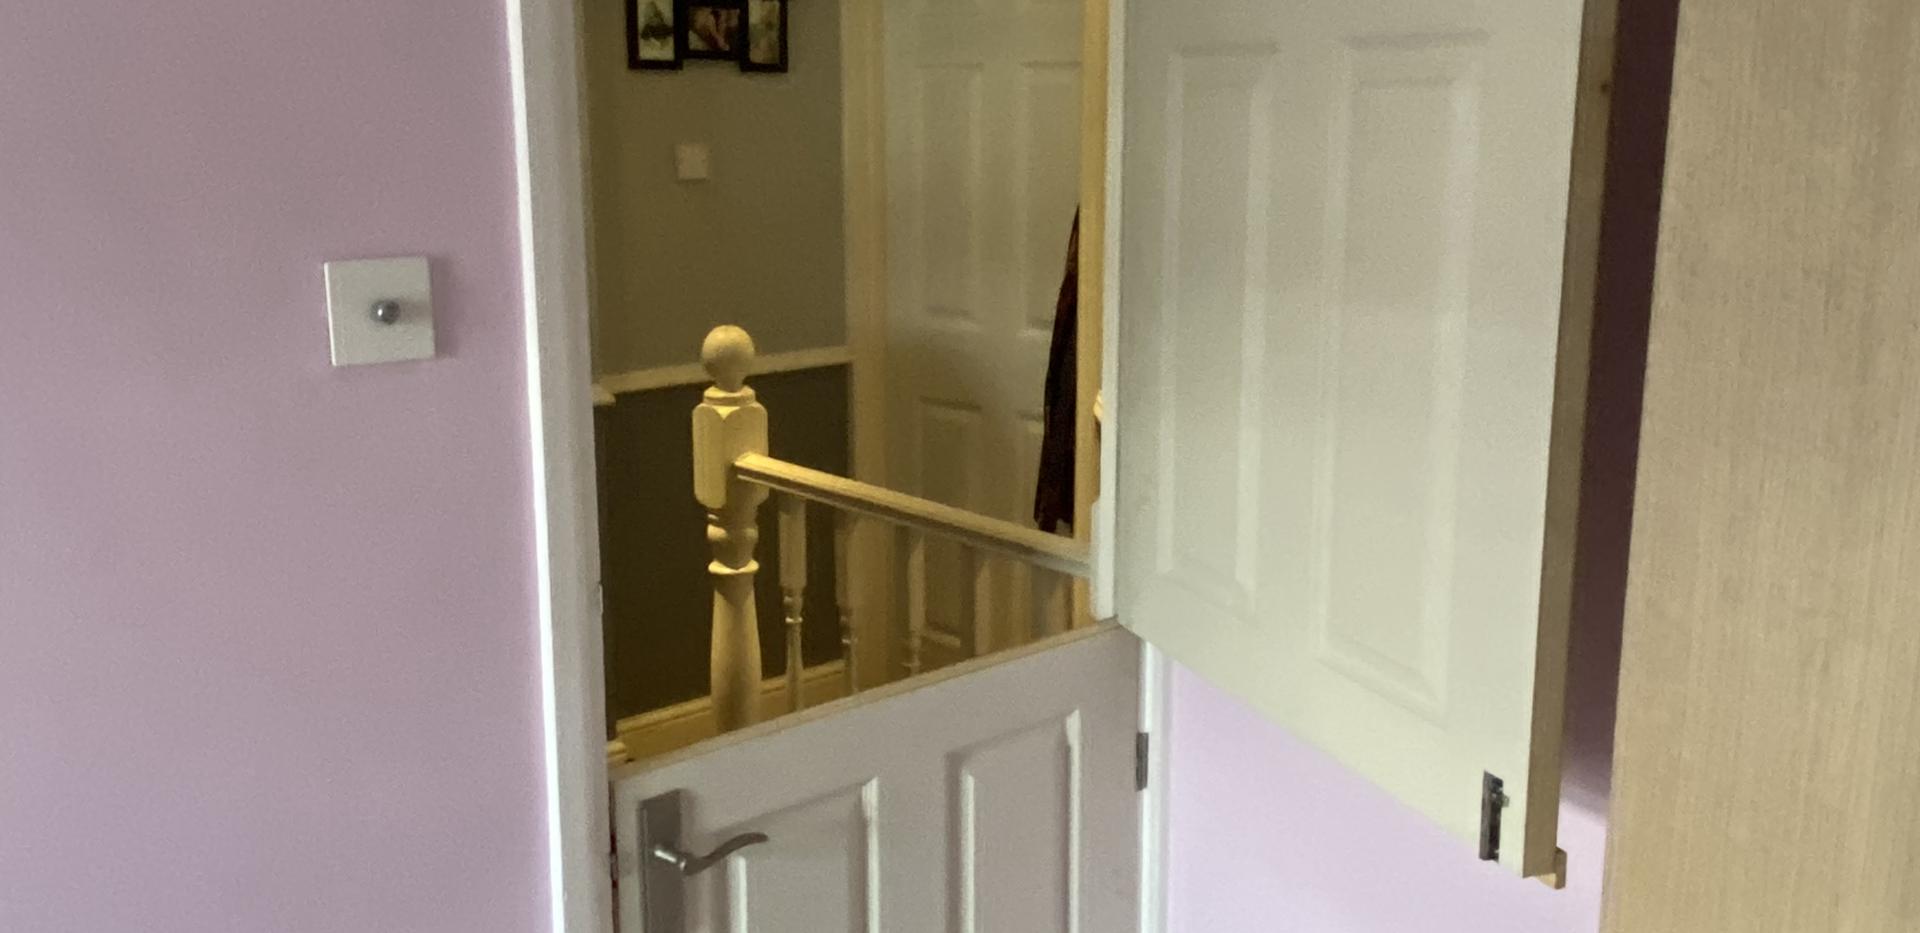 Child safety stable door